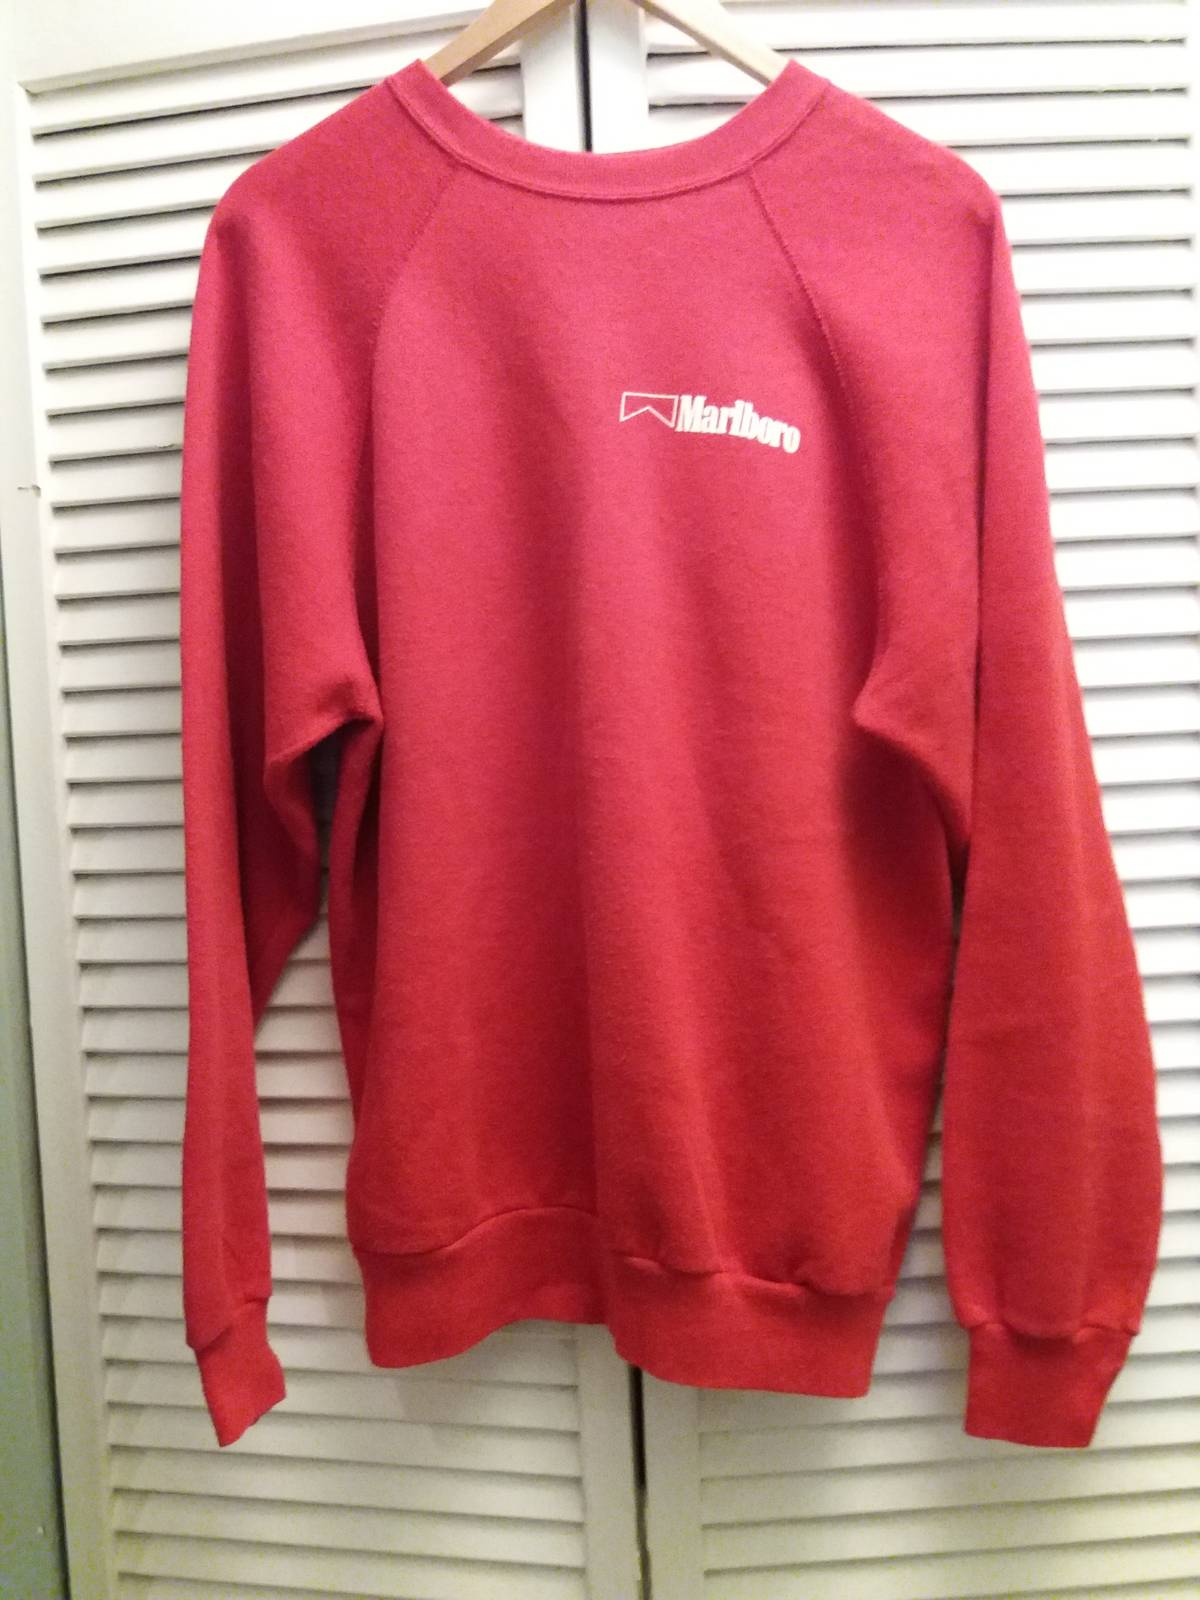 Marlboro Classics × Tultex × Vintage 90s Tultex Marlboro Cigarettes Red Pullover Crewneck Sweater Fits Like Size L Large Size L $22